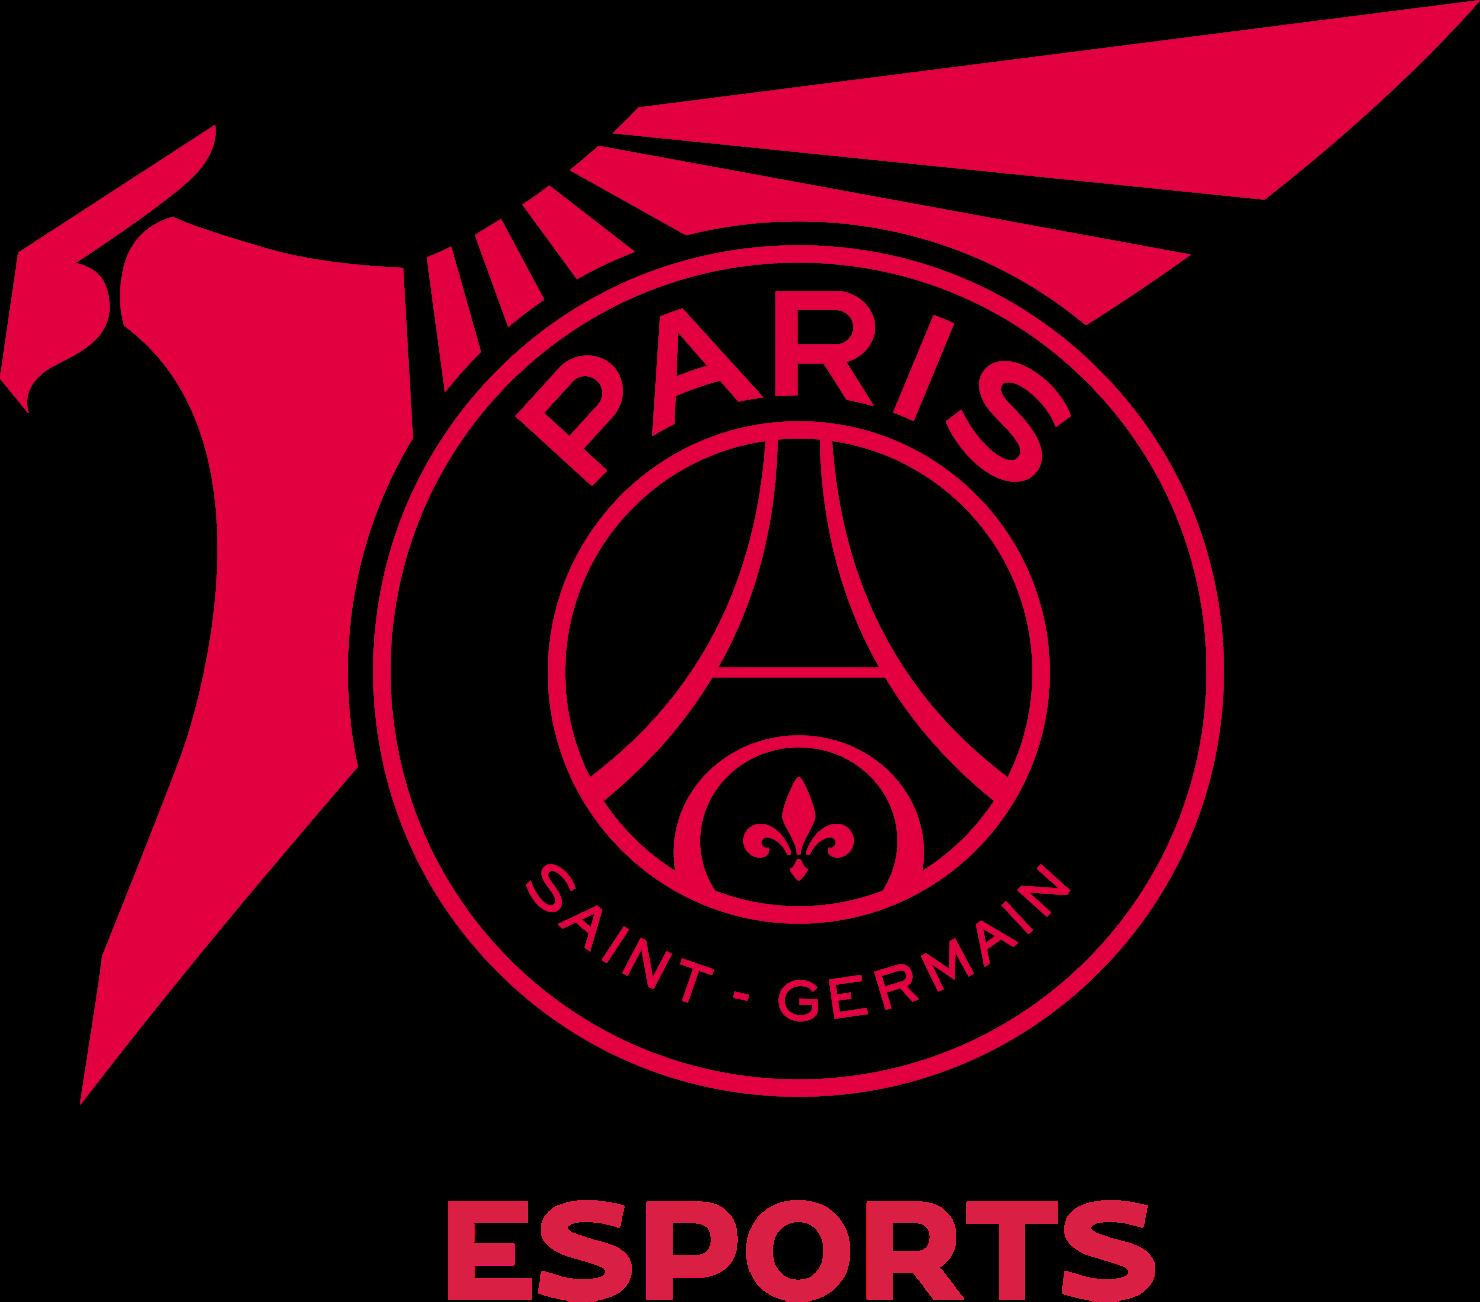 psg esports logo